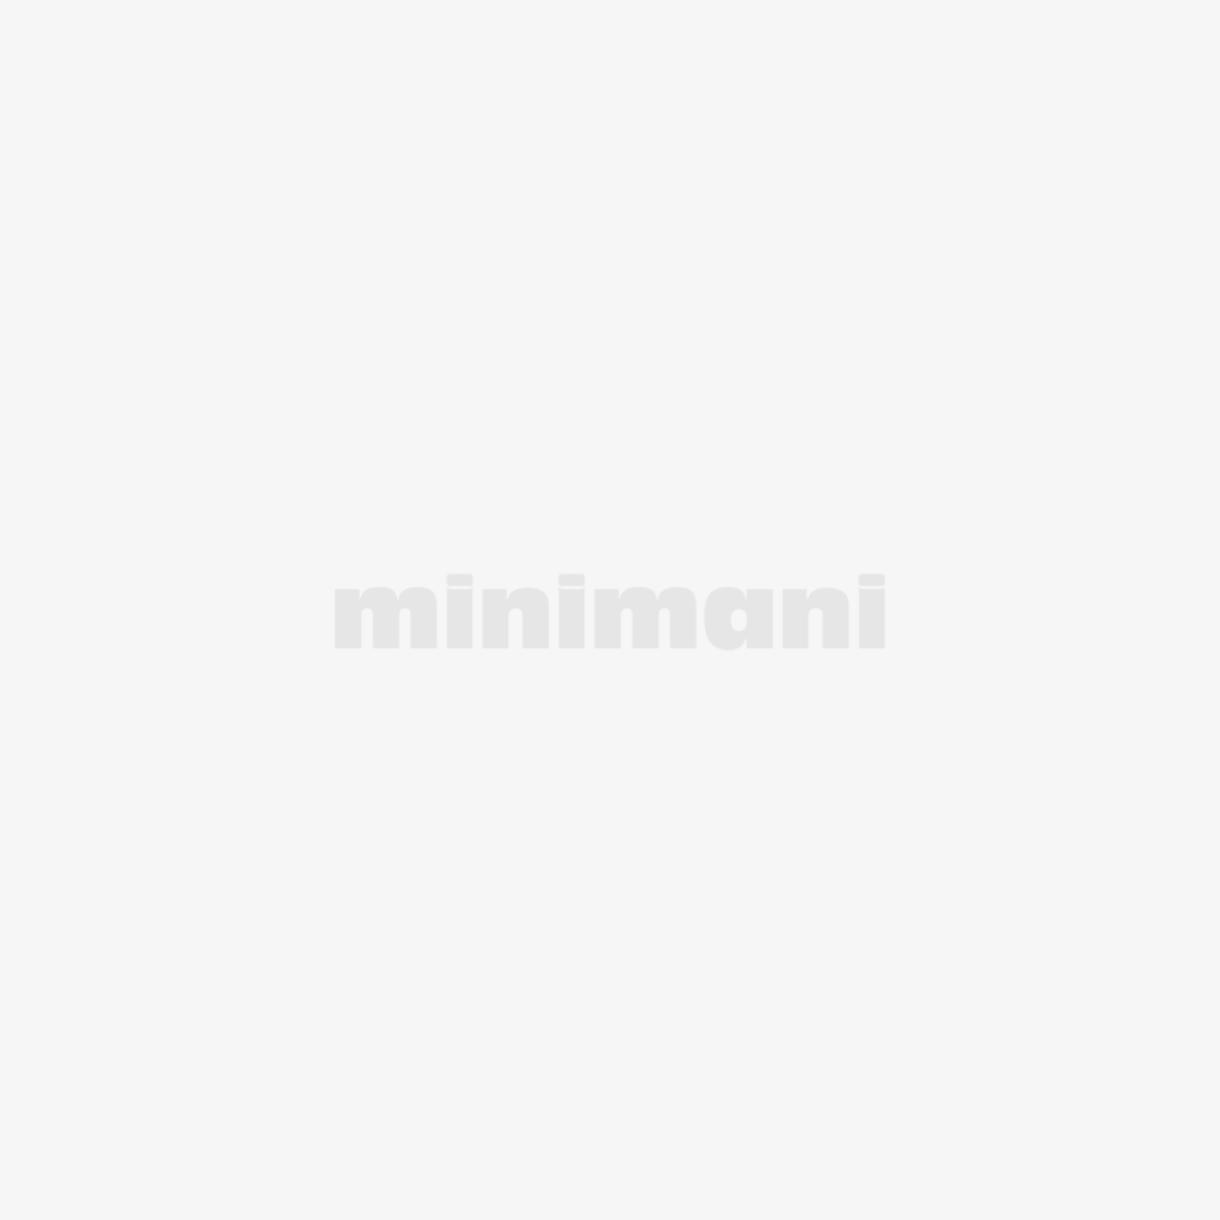 FINNWEAR NAISTEN PITKIKSET, BAMBU M 1210 SORT